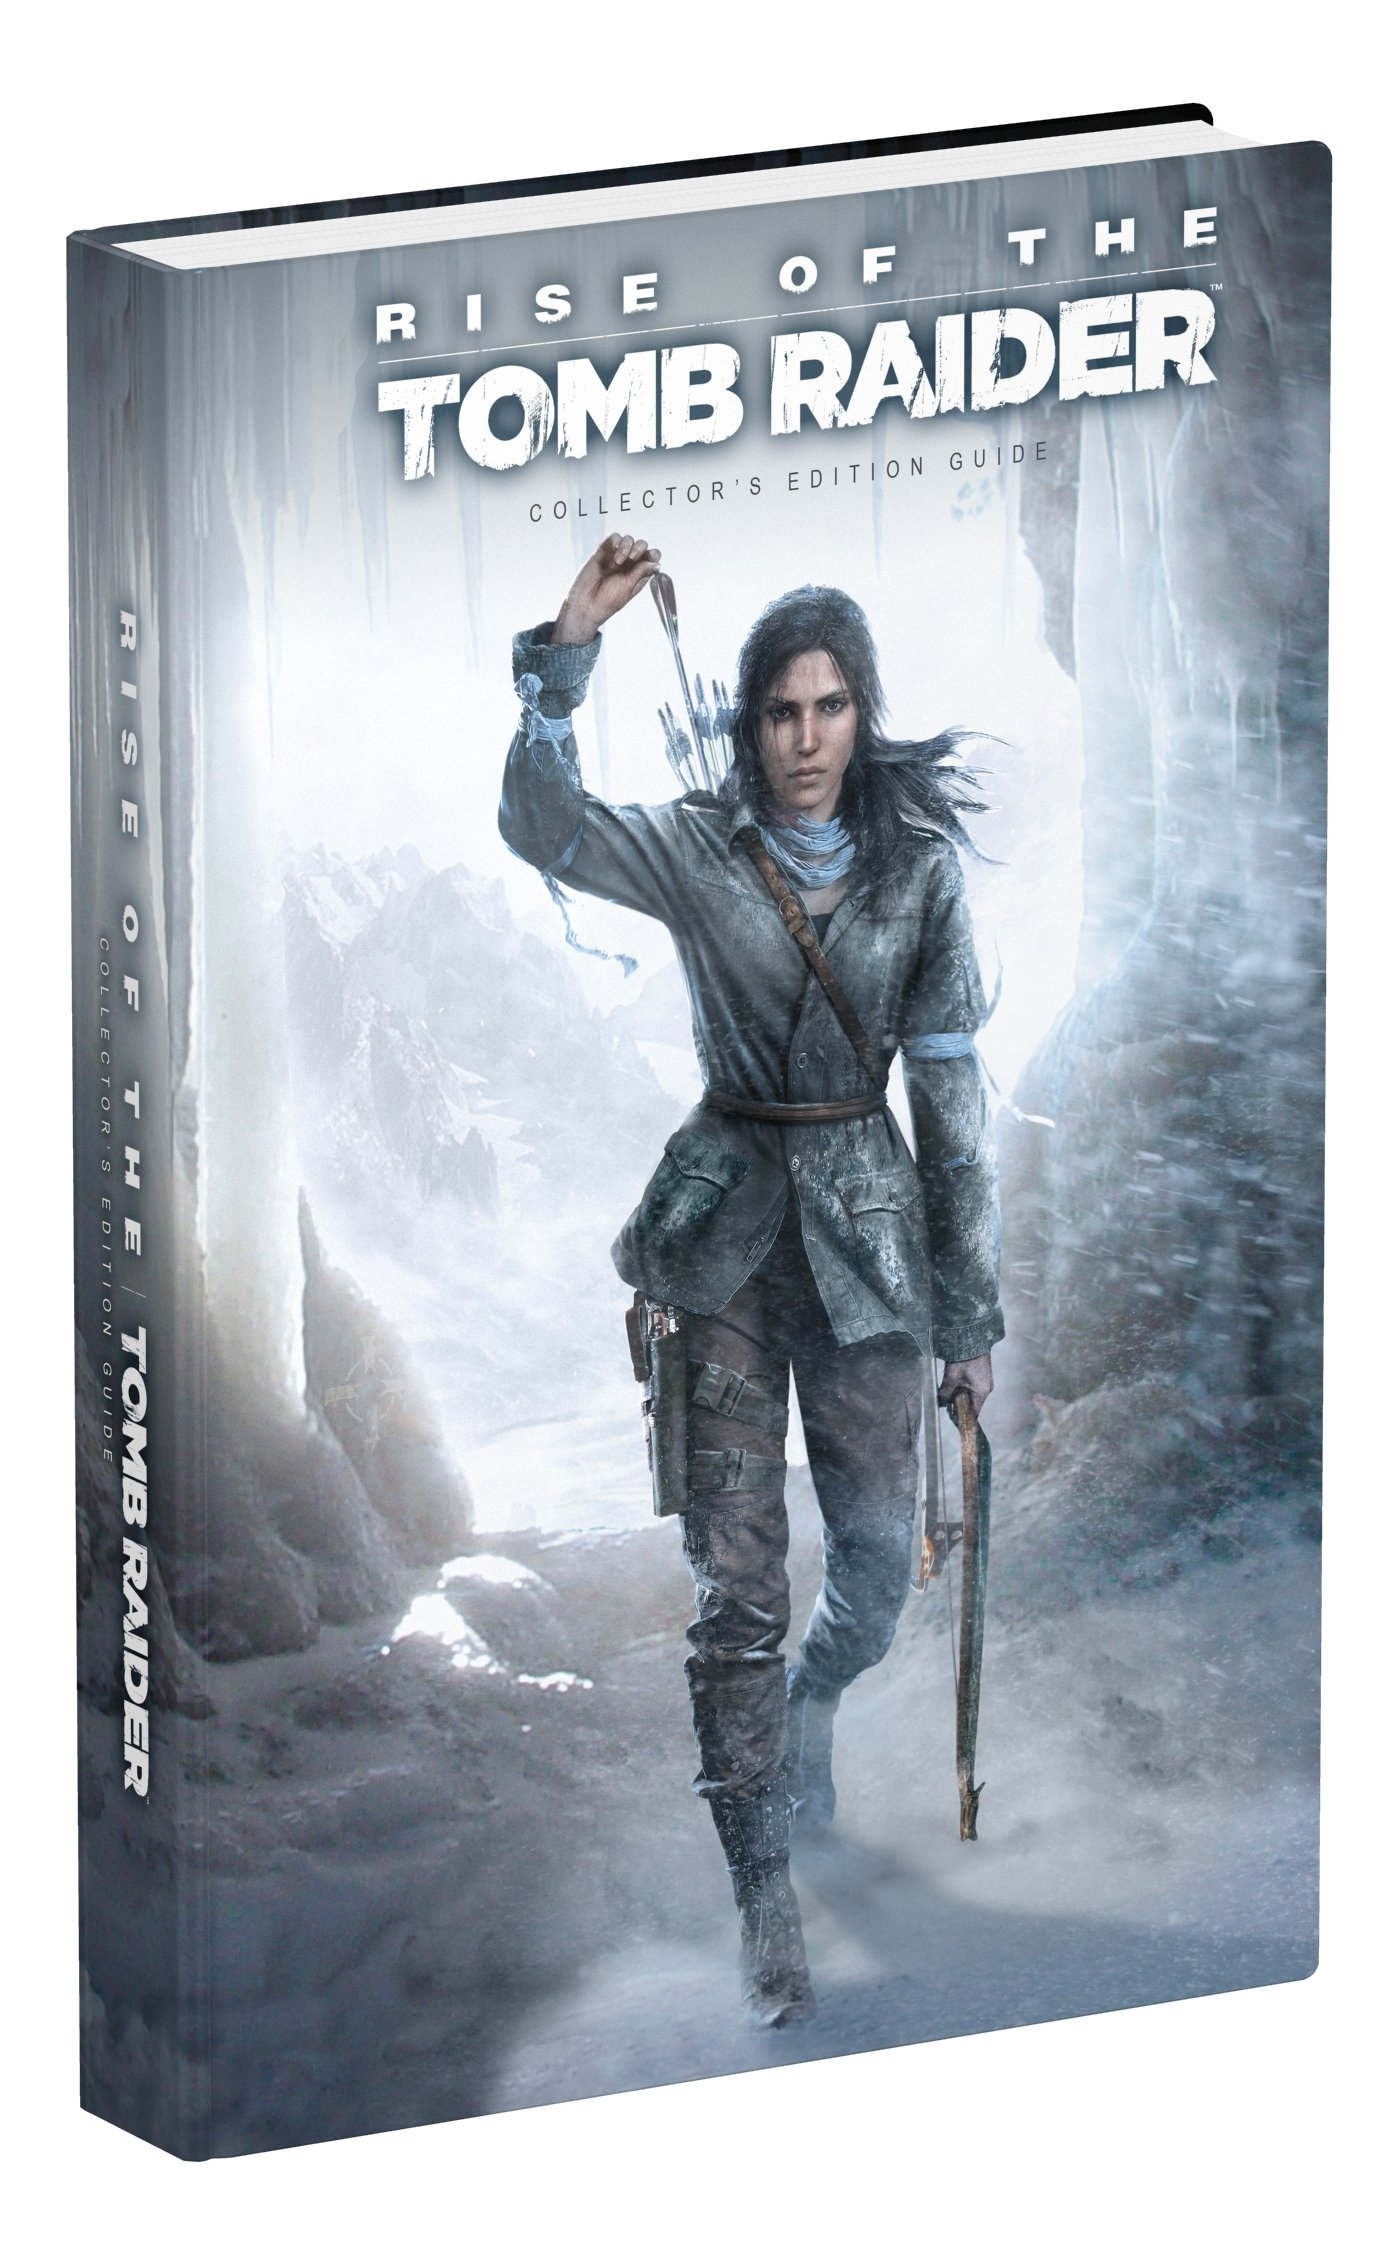 High Quality Prints Rise of the Tomb Raider Box Art Tomb Raider Poster